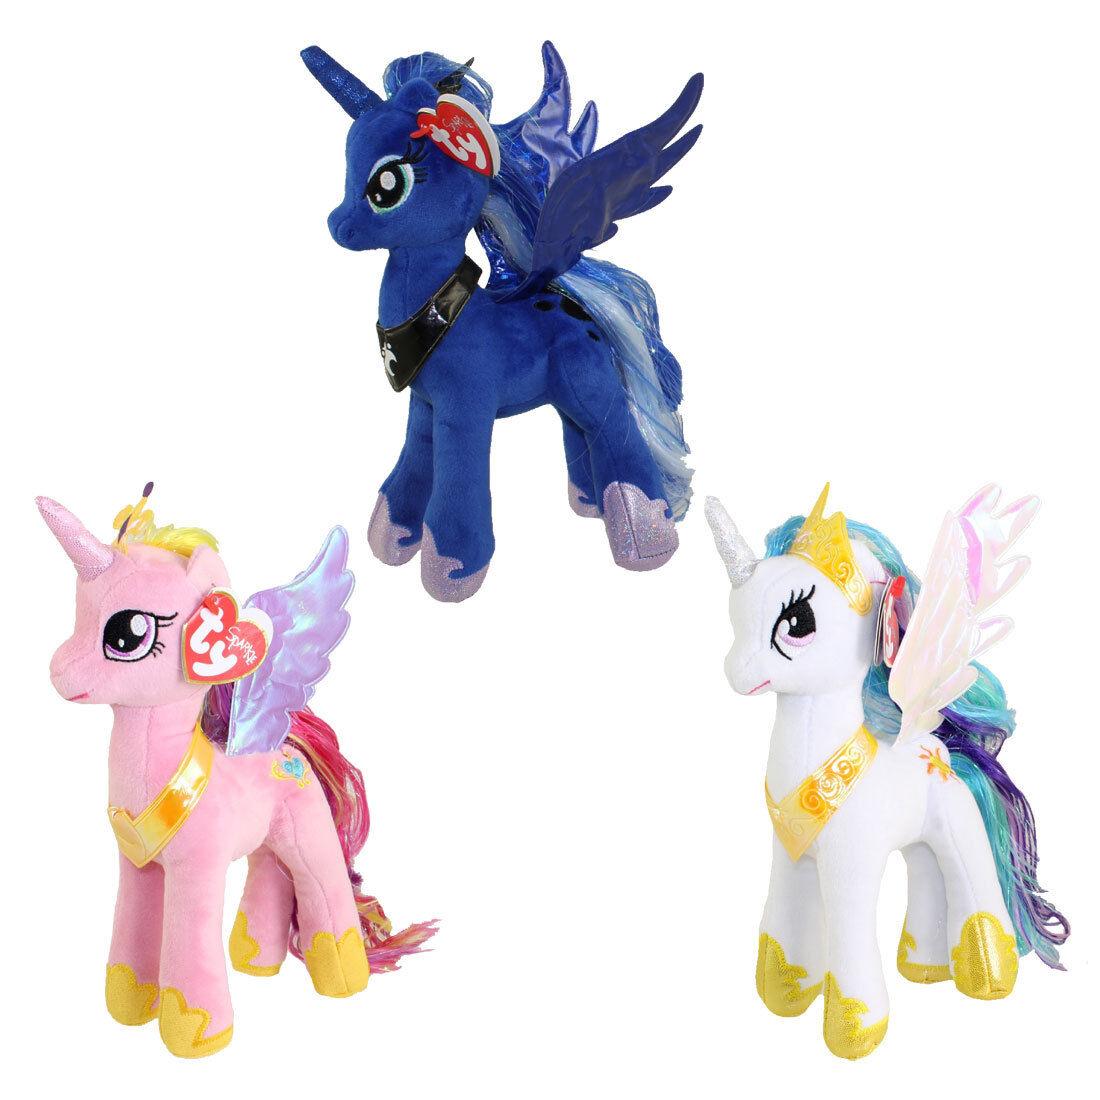 TY Beanie Babies - My Little Pony- SET of 3 PRINCESS (Cadance, Luna & Celestia)